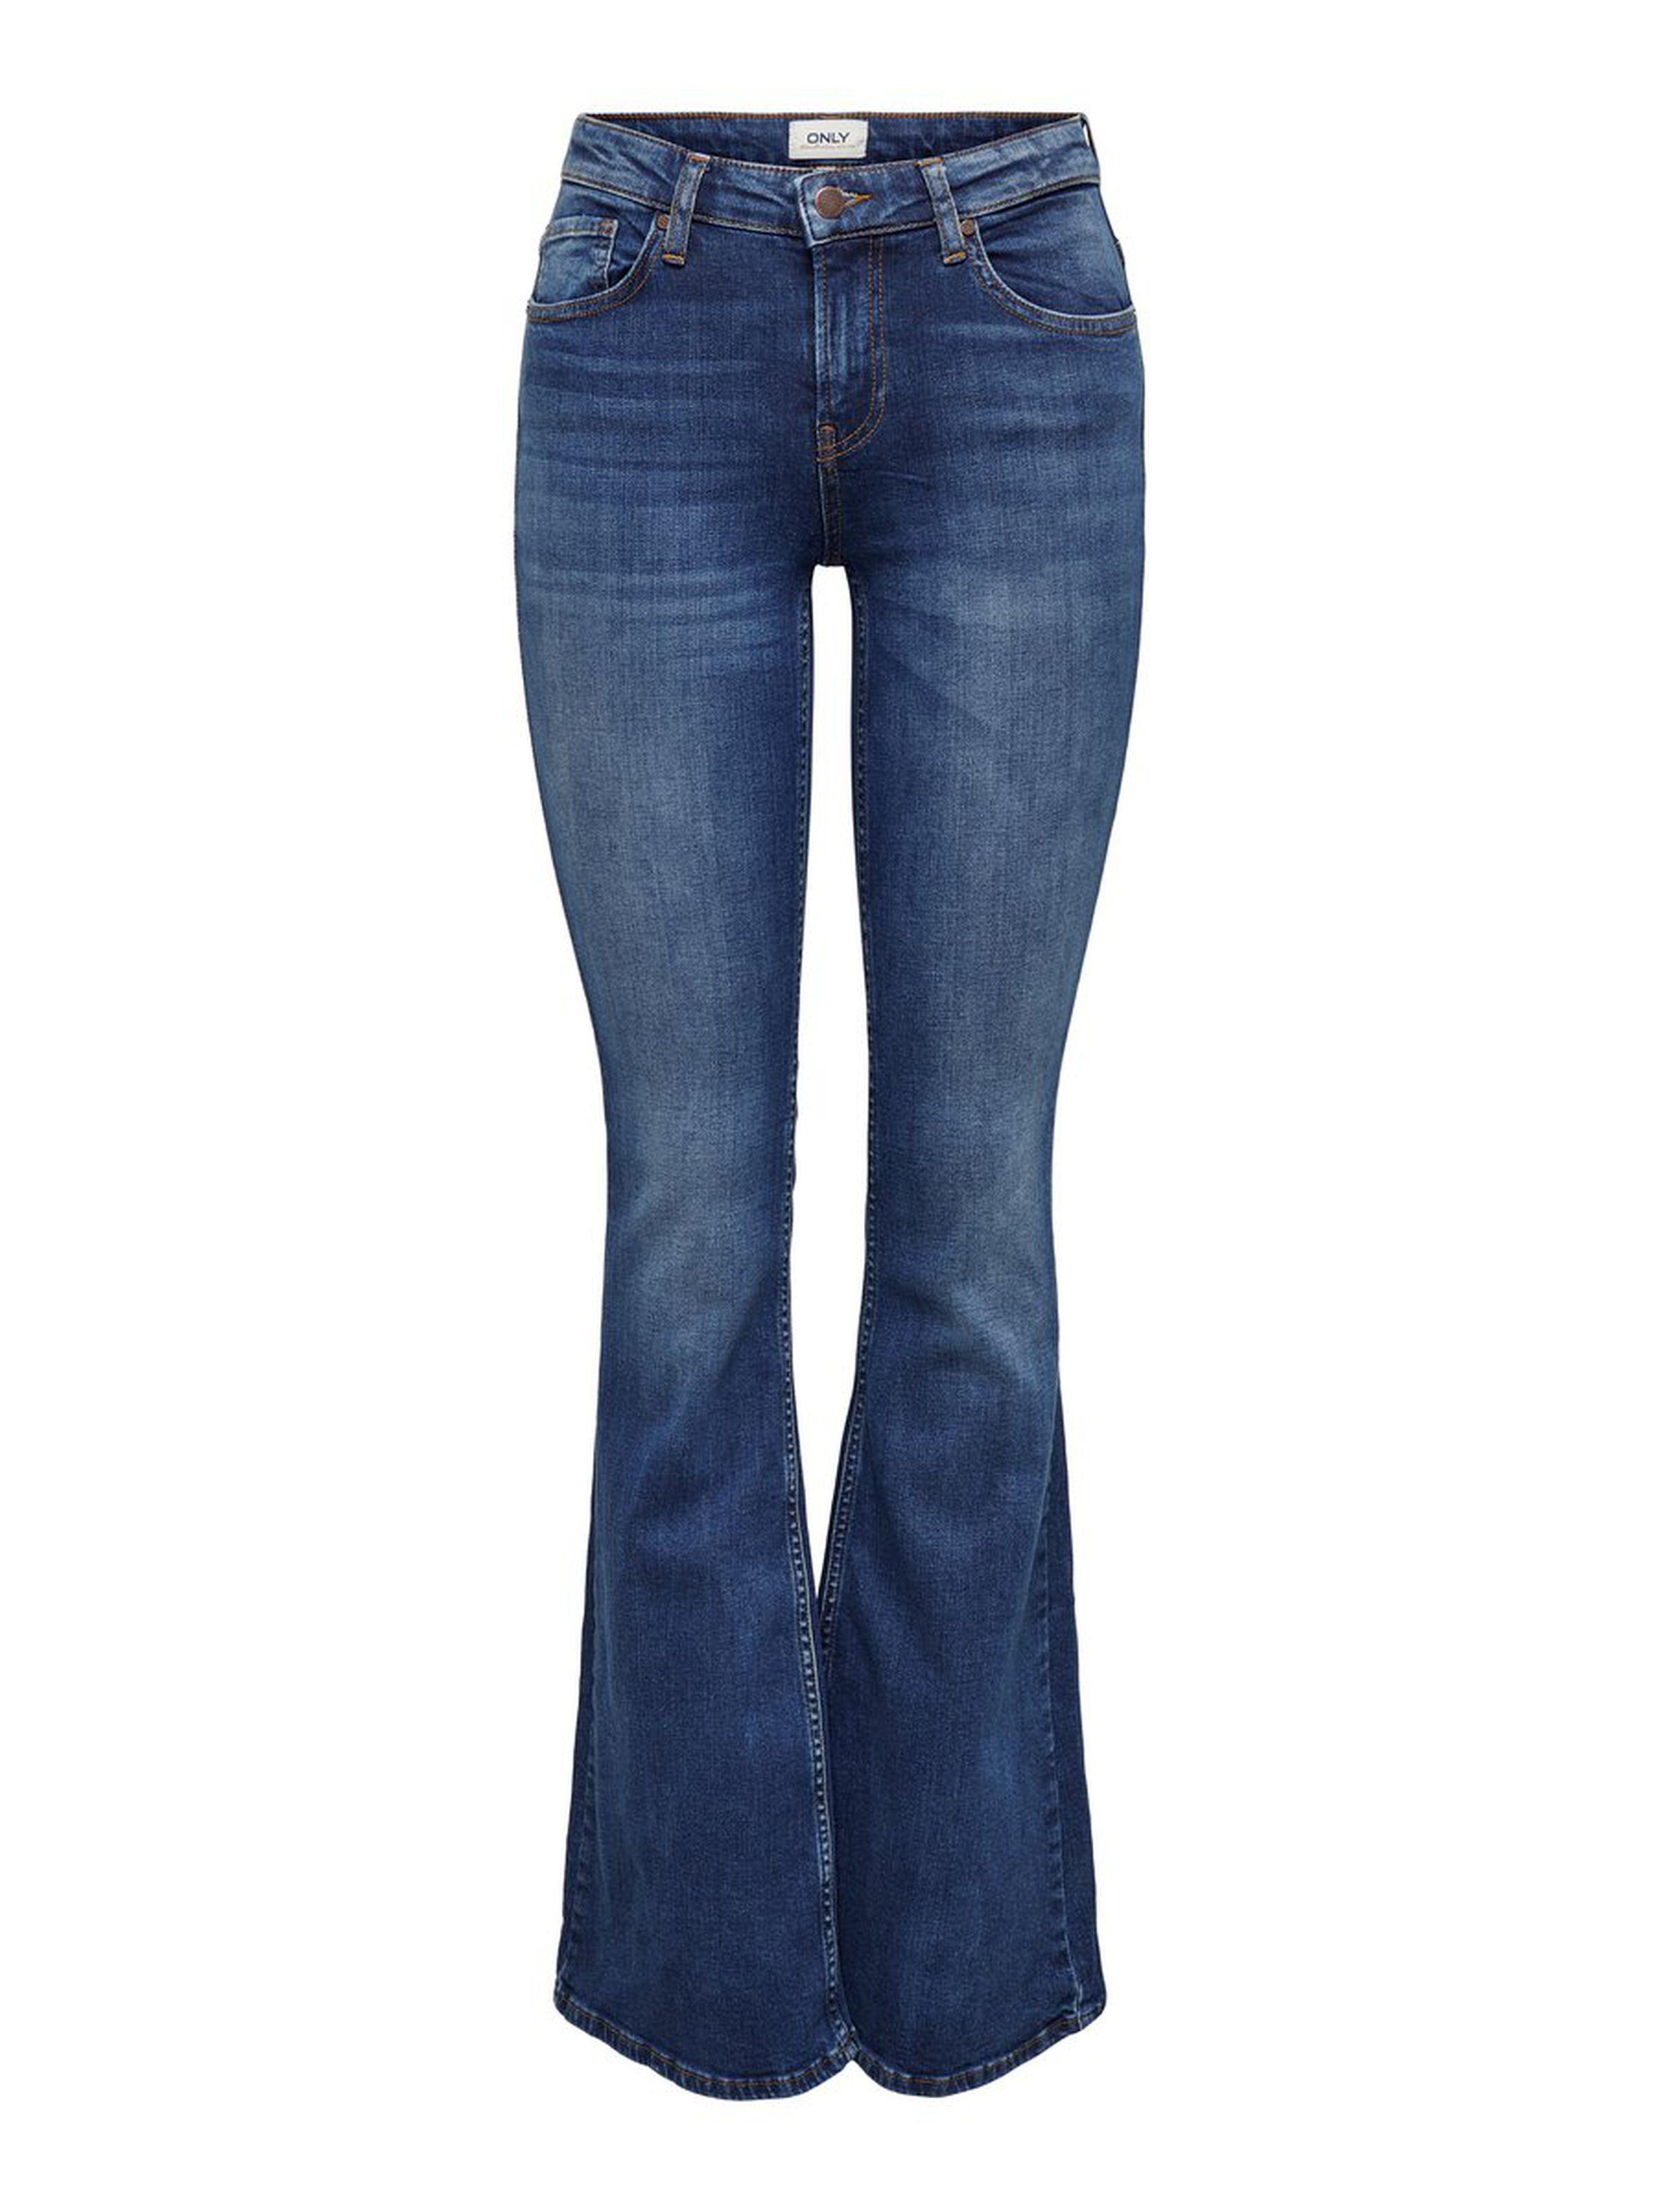 ONLY   Jeans   15209512MEDIUMBLUEDENIM